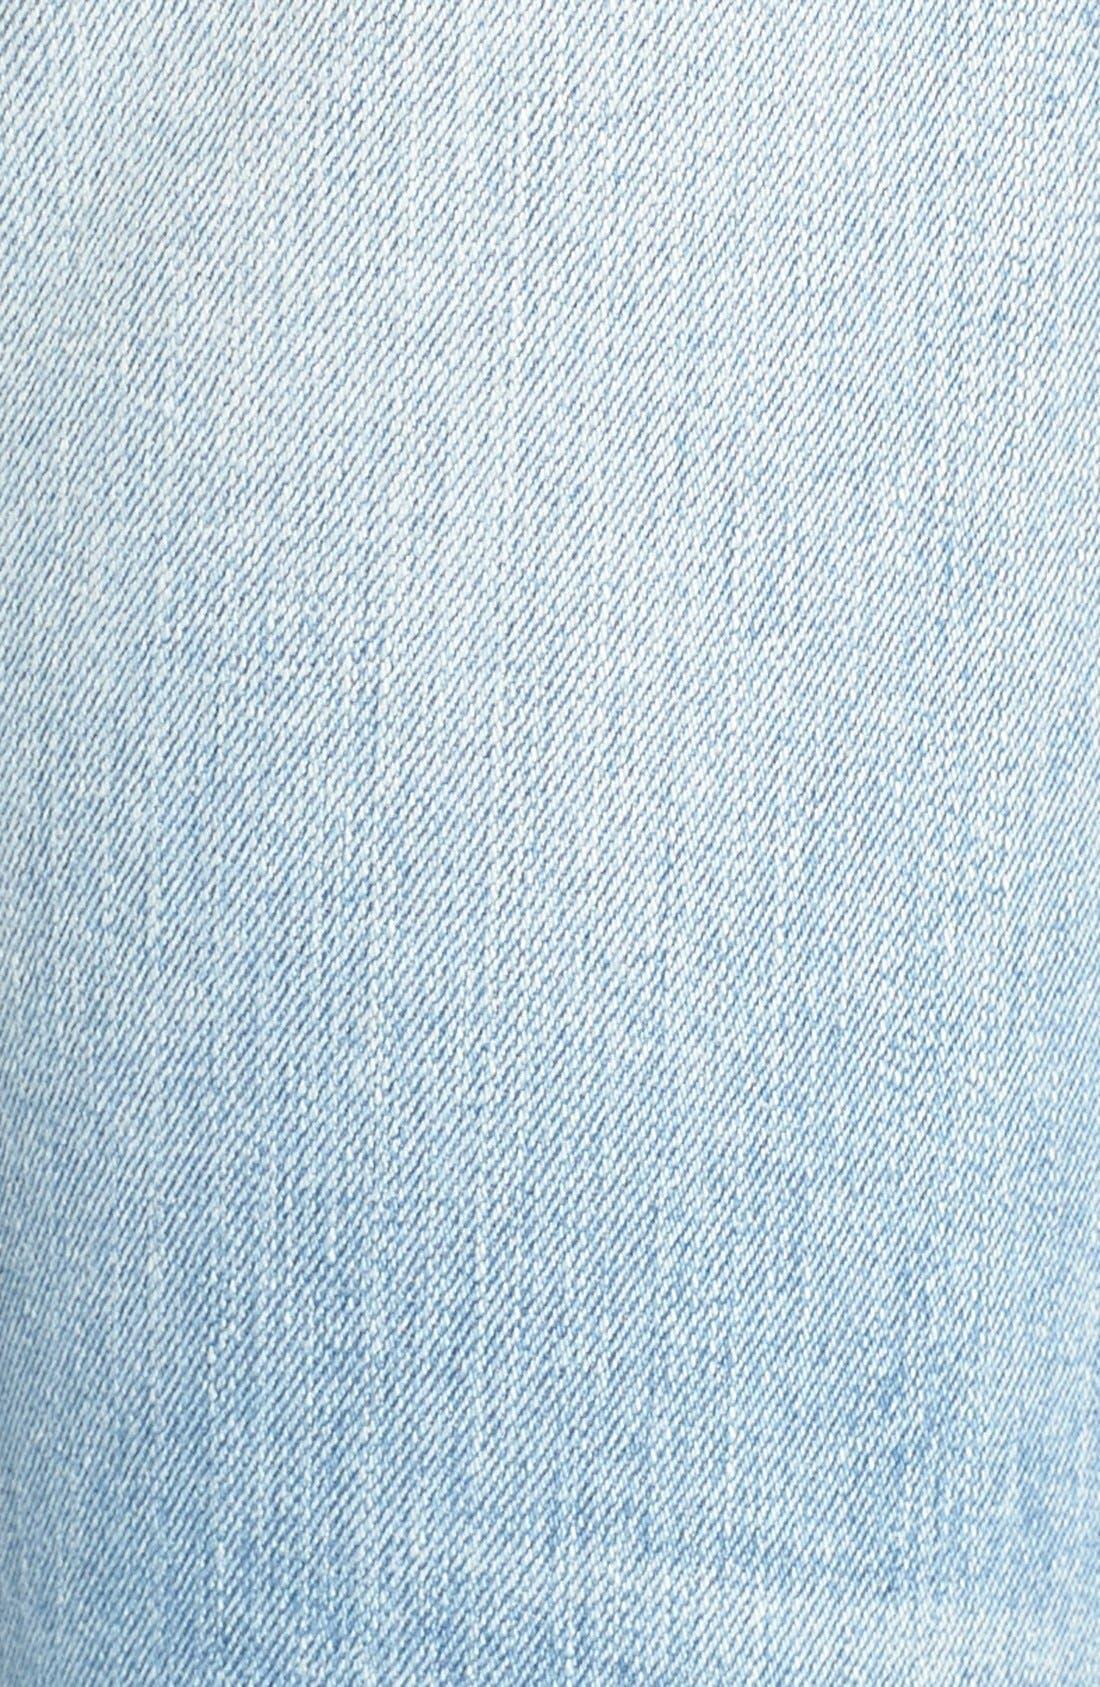 Alternate Image 5  - Joe's 'Icon' Destroyed Ankle Jeans (Margie)